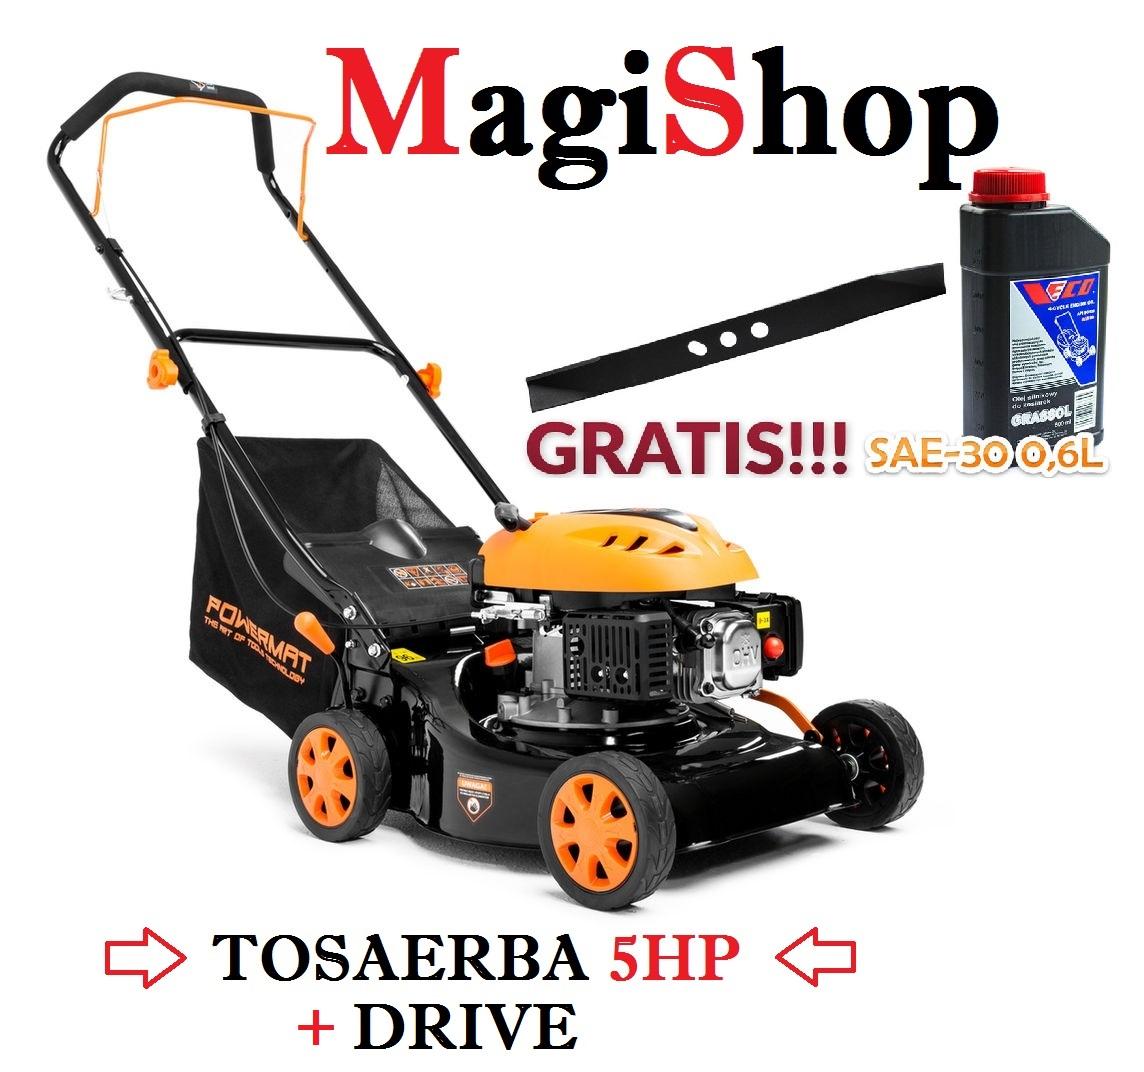 Tosaerba 5HP 139cc - 40cm + Drive - PM-KS-500N